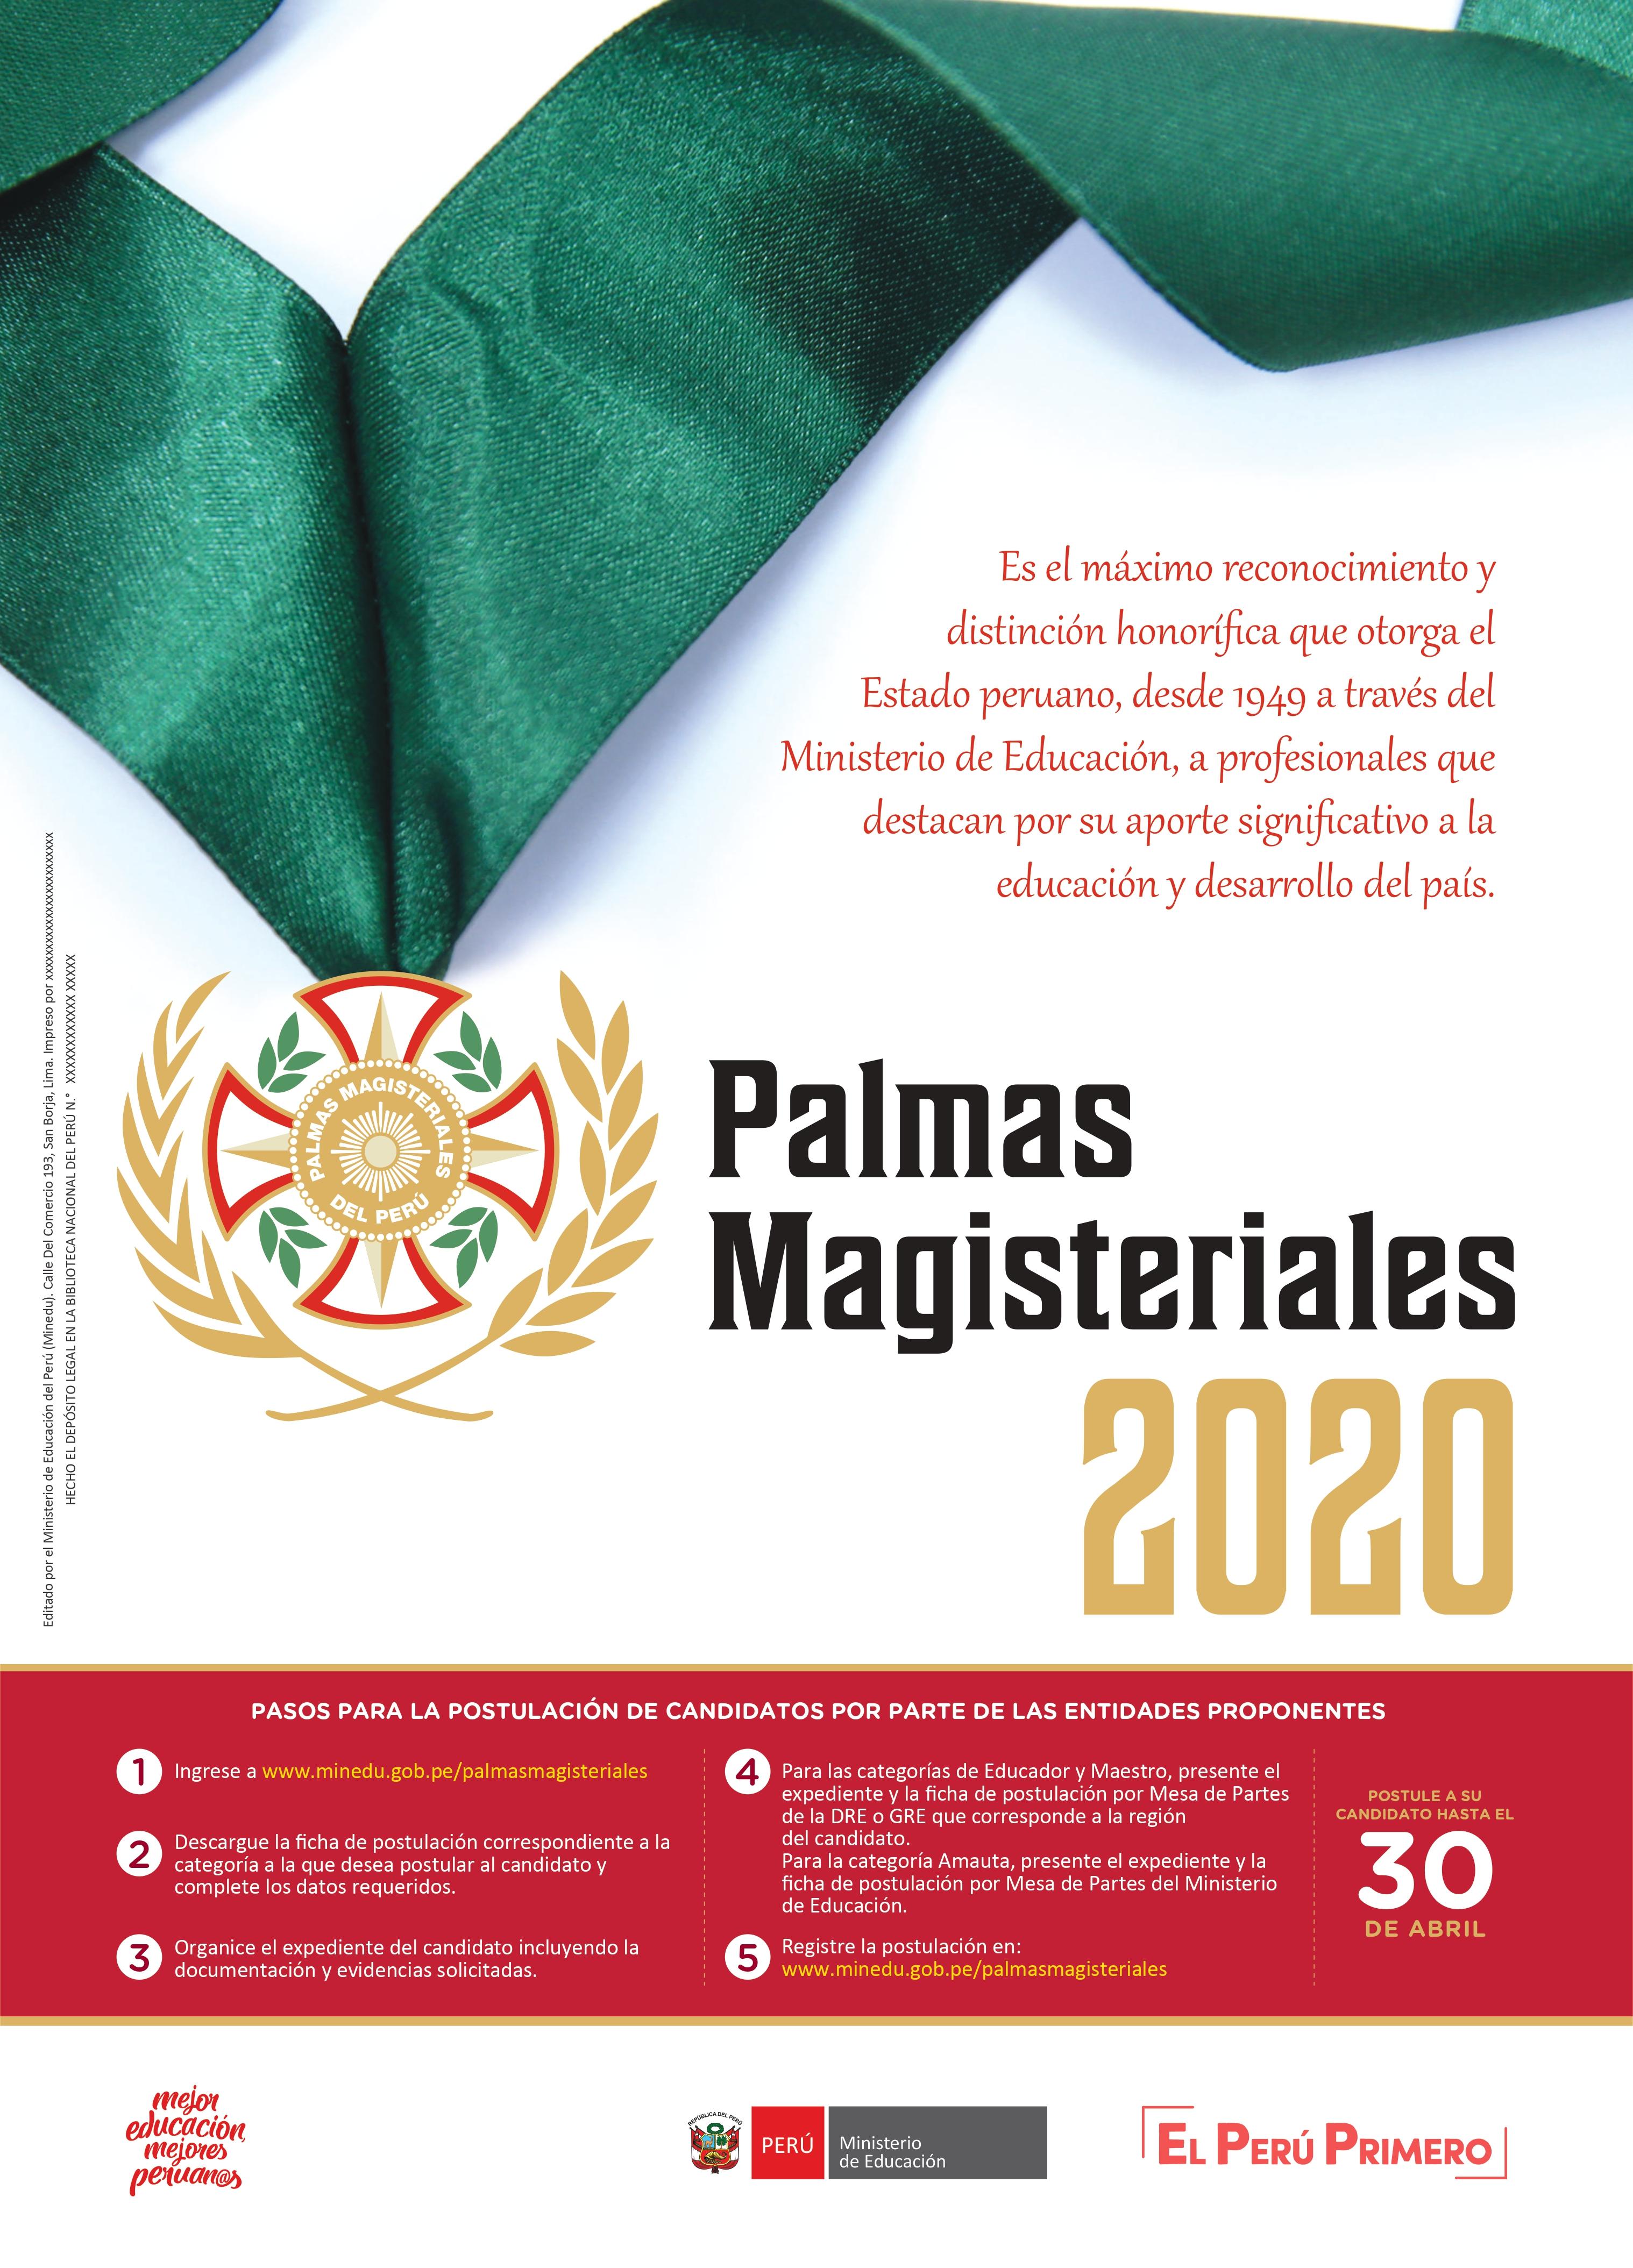 PALMAS MAGISTERIALES 2020